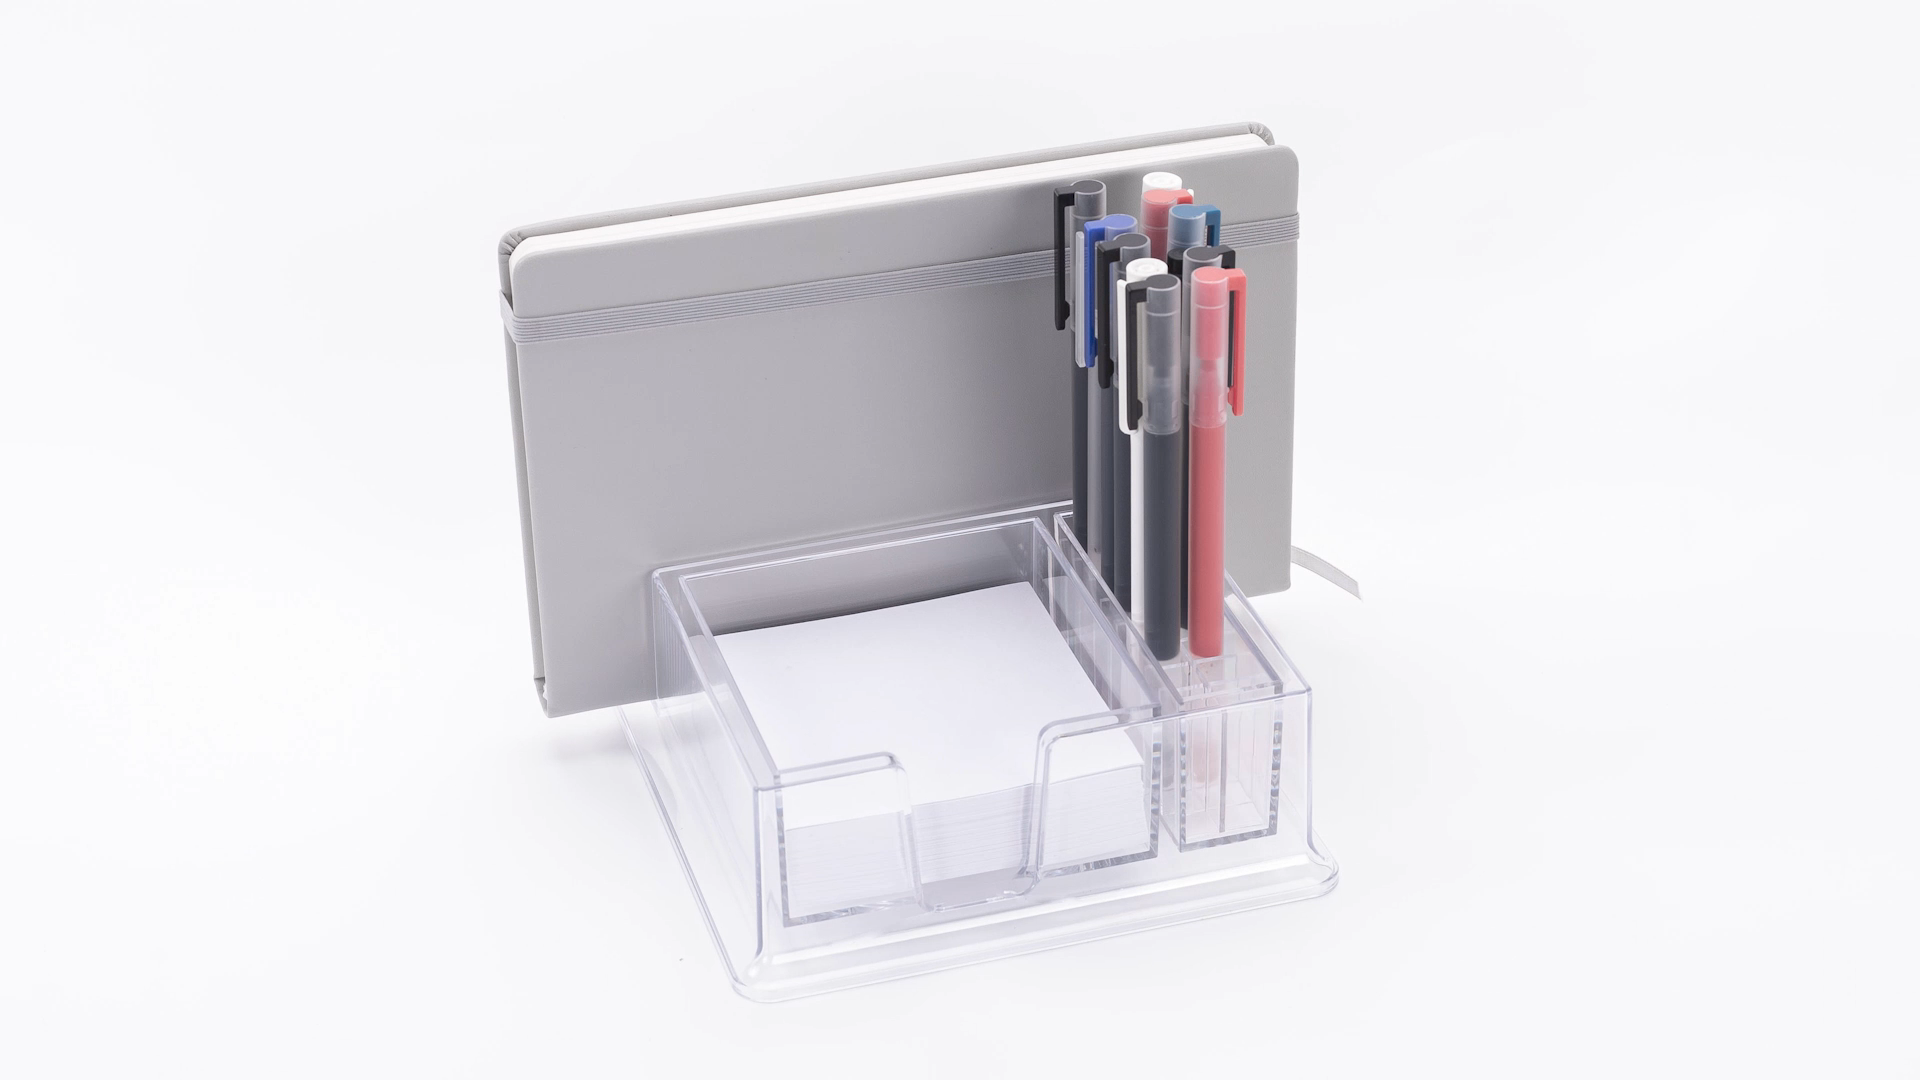 Plastic Clear  desk organization 9.5 x 9.5 cm card holder Note holder with pen holder